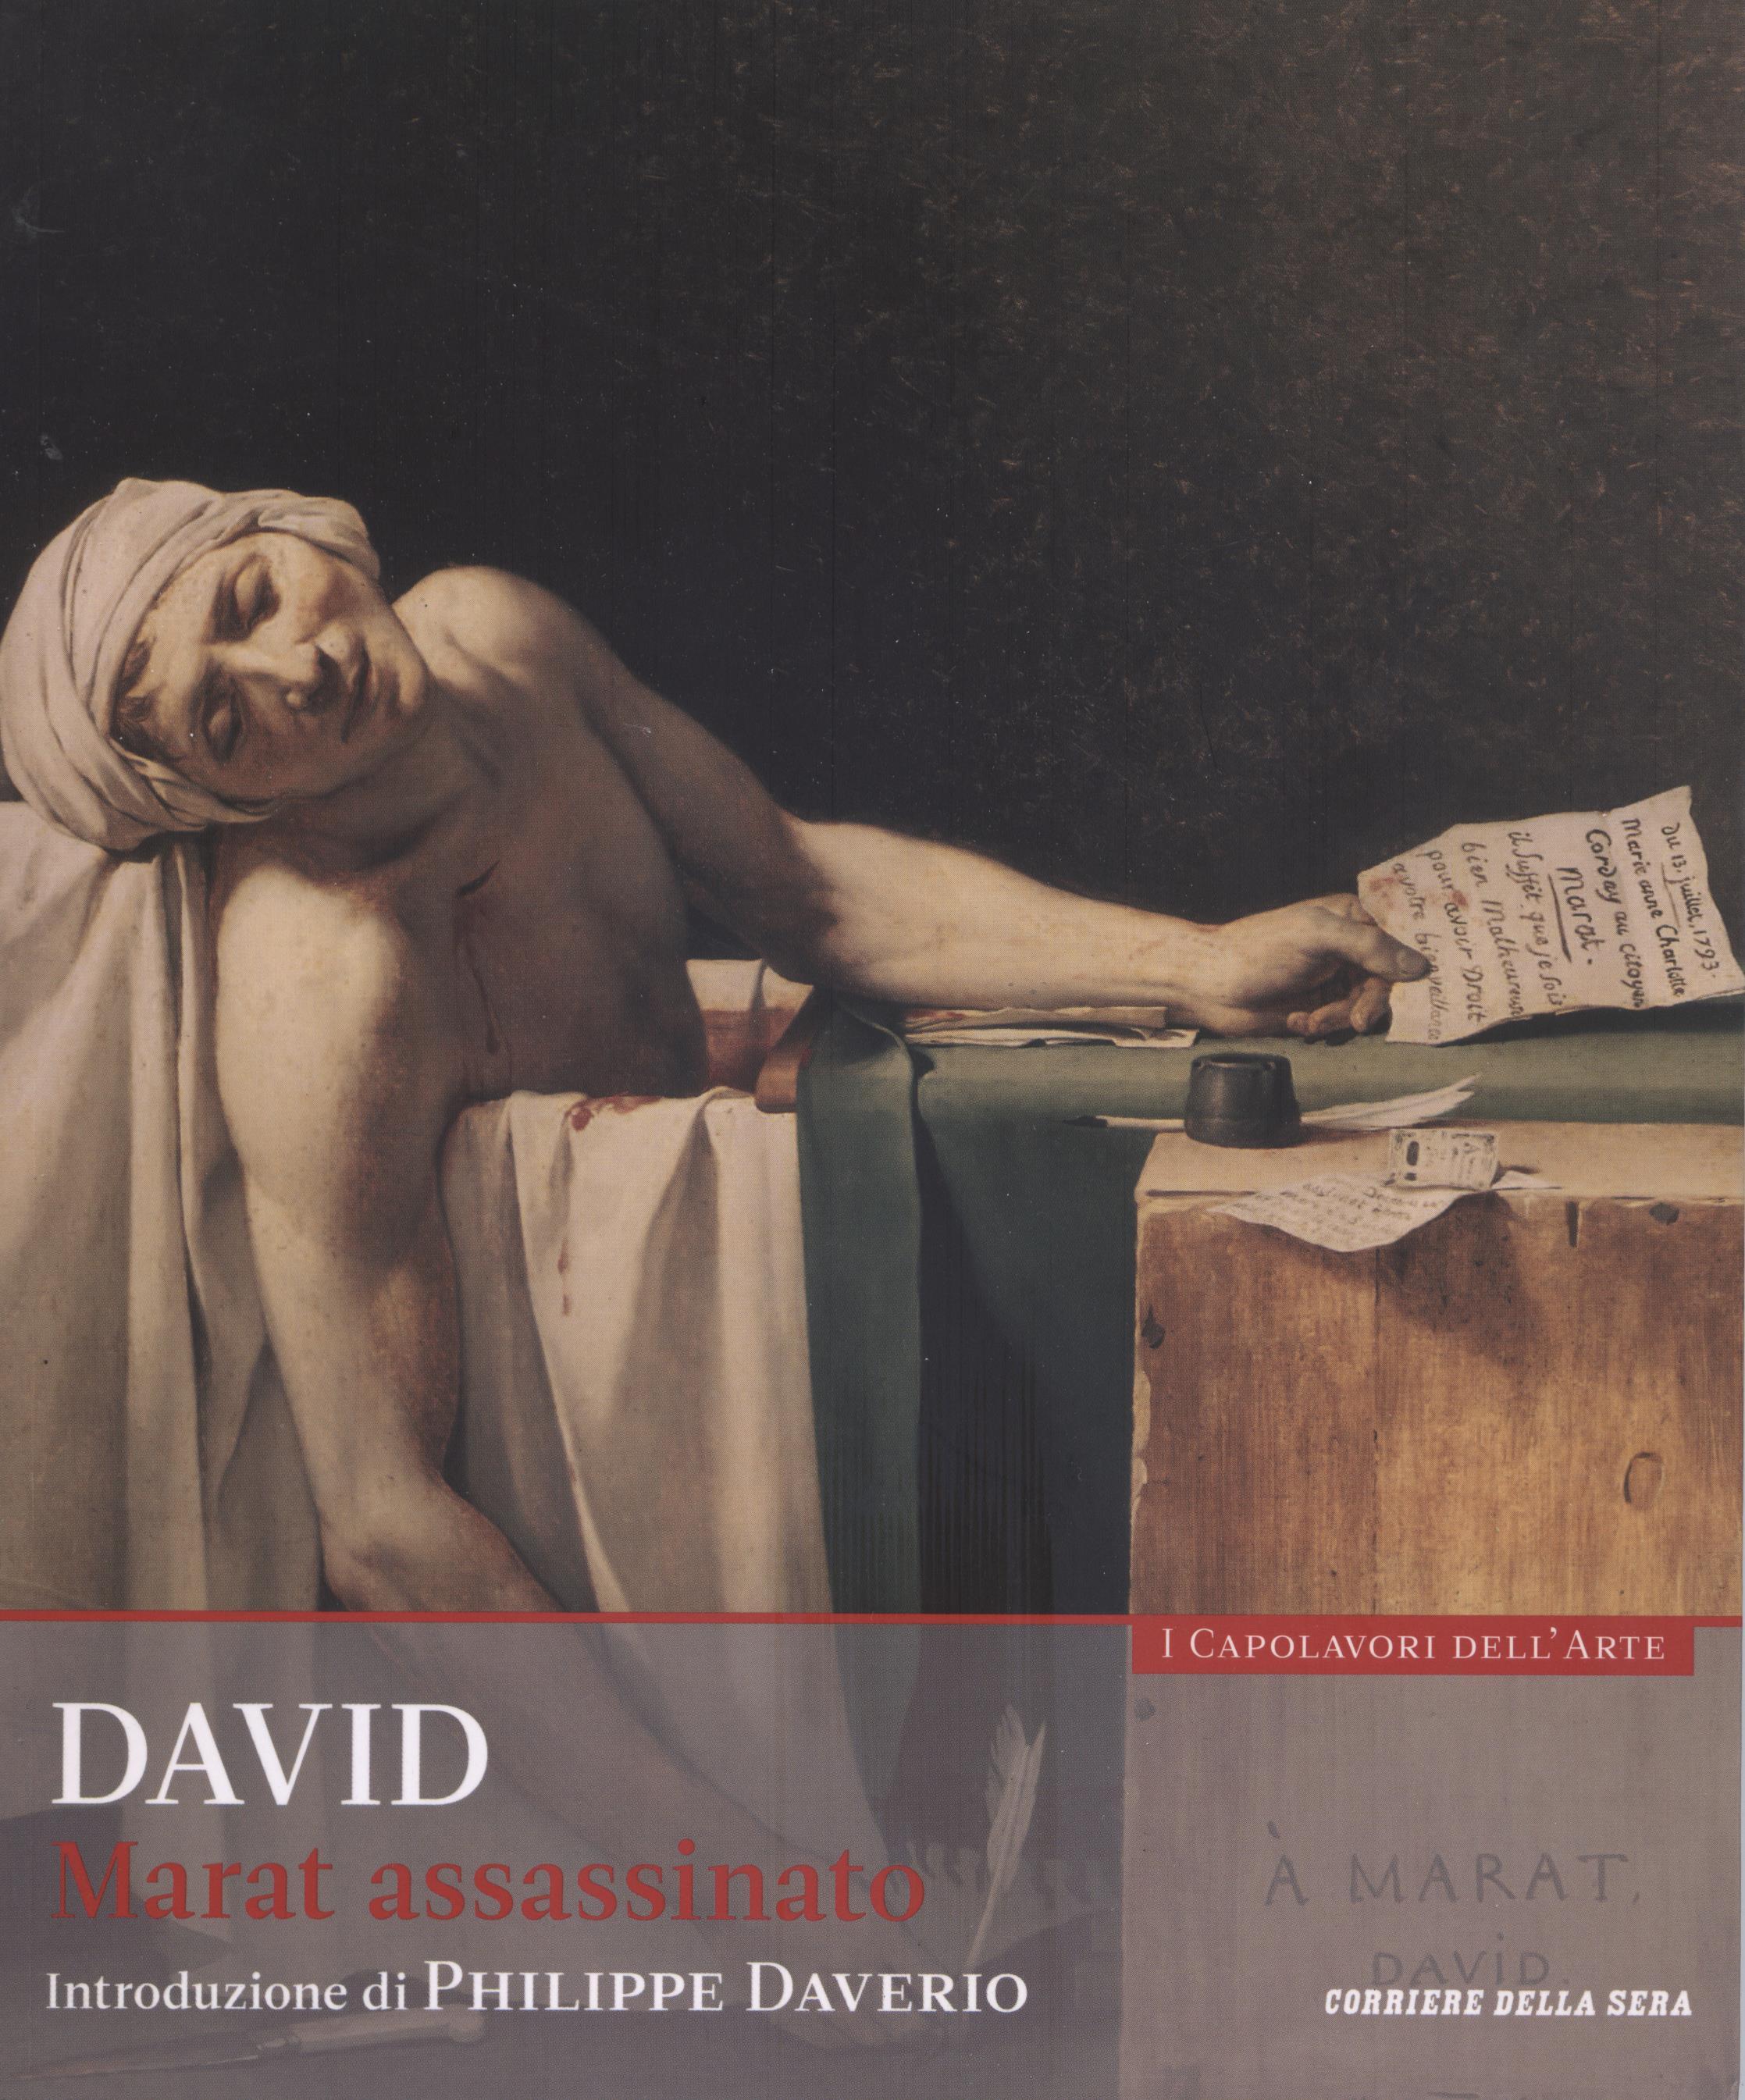 David - Marat assassinato